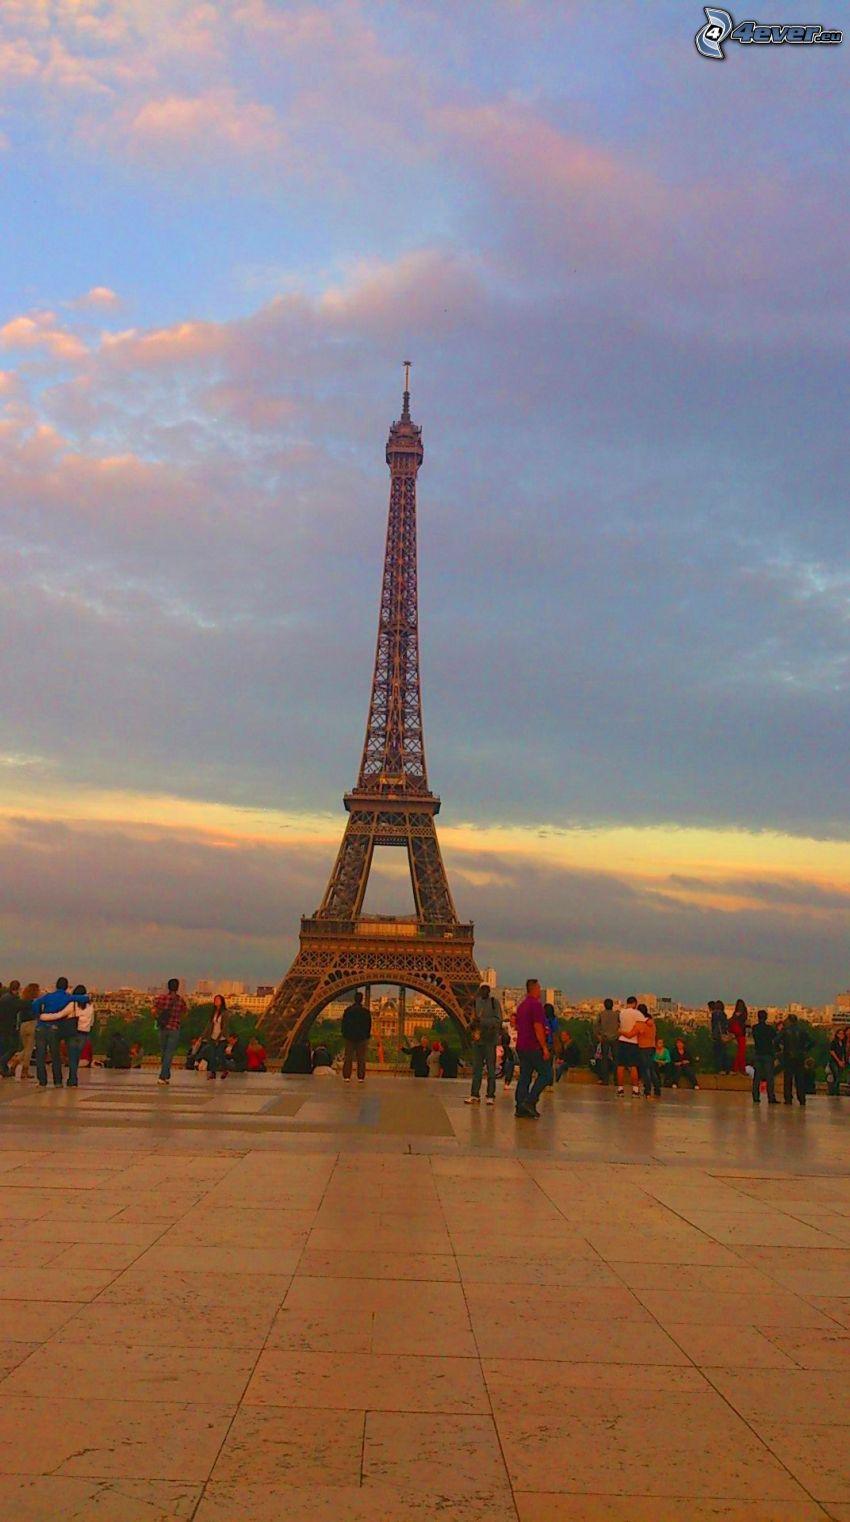 Torre Eiffel, Parigi, Francia, gente, piastrelle